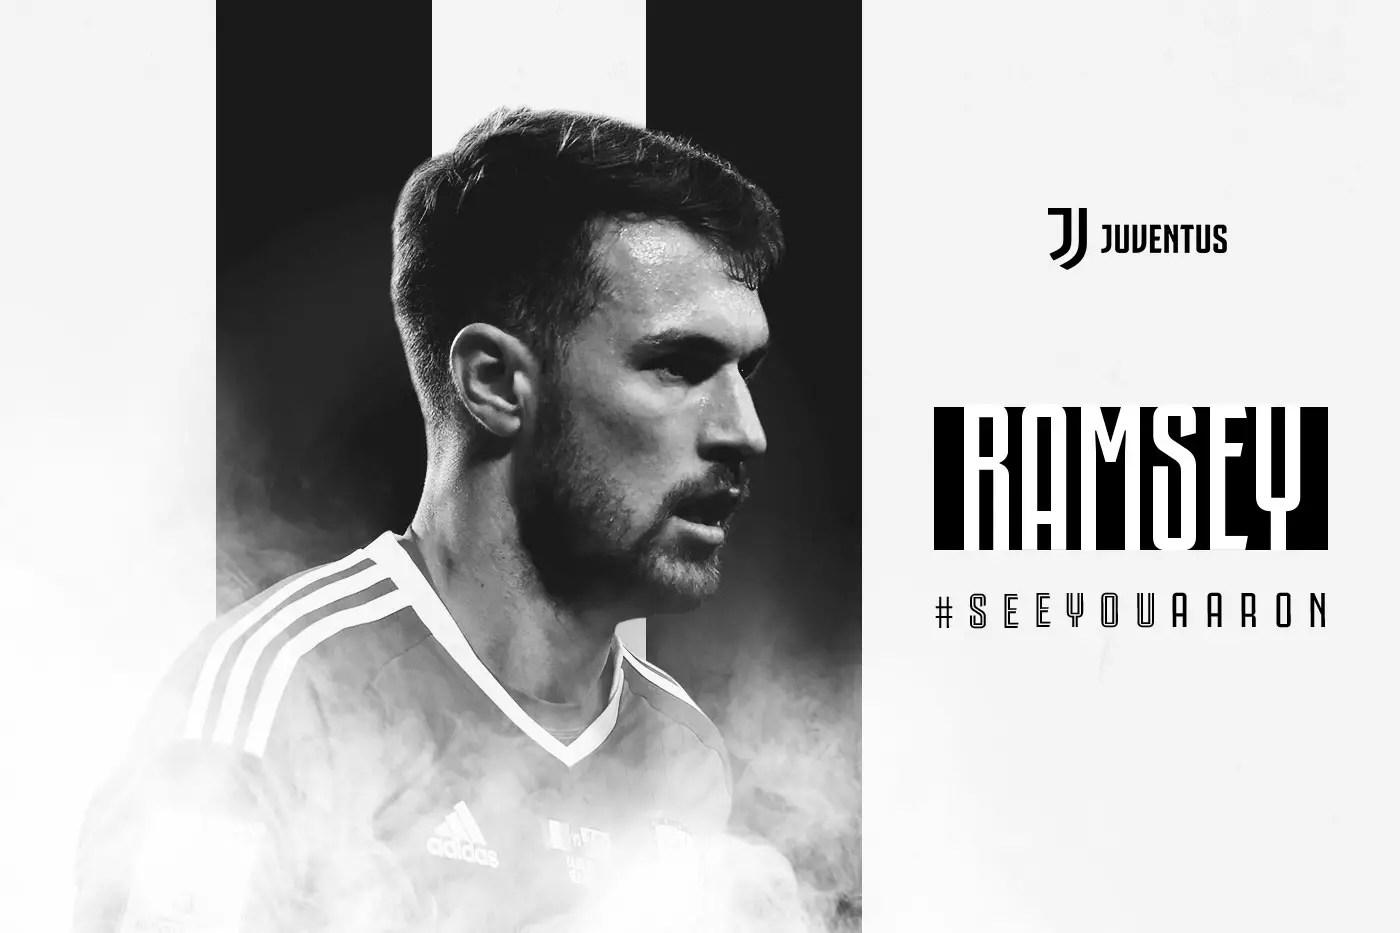 Juventus Confirm Ramsey Deal